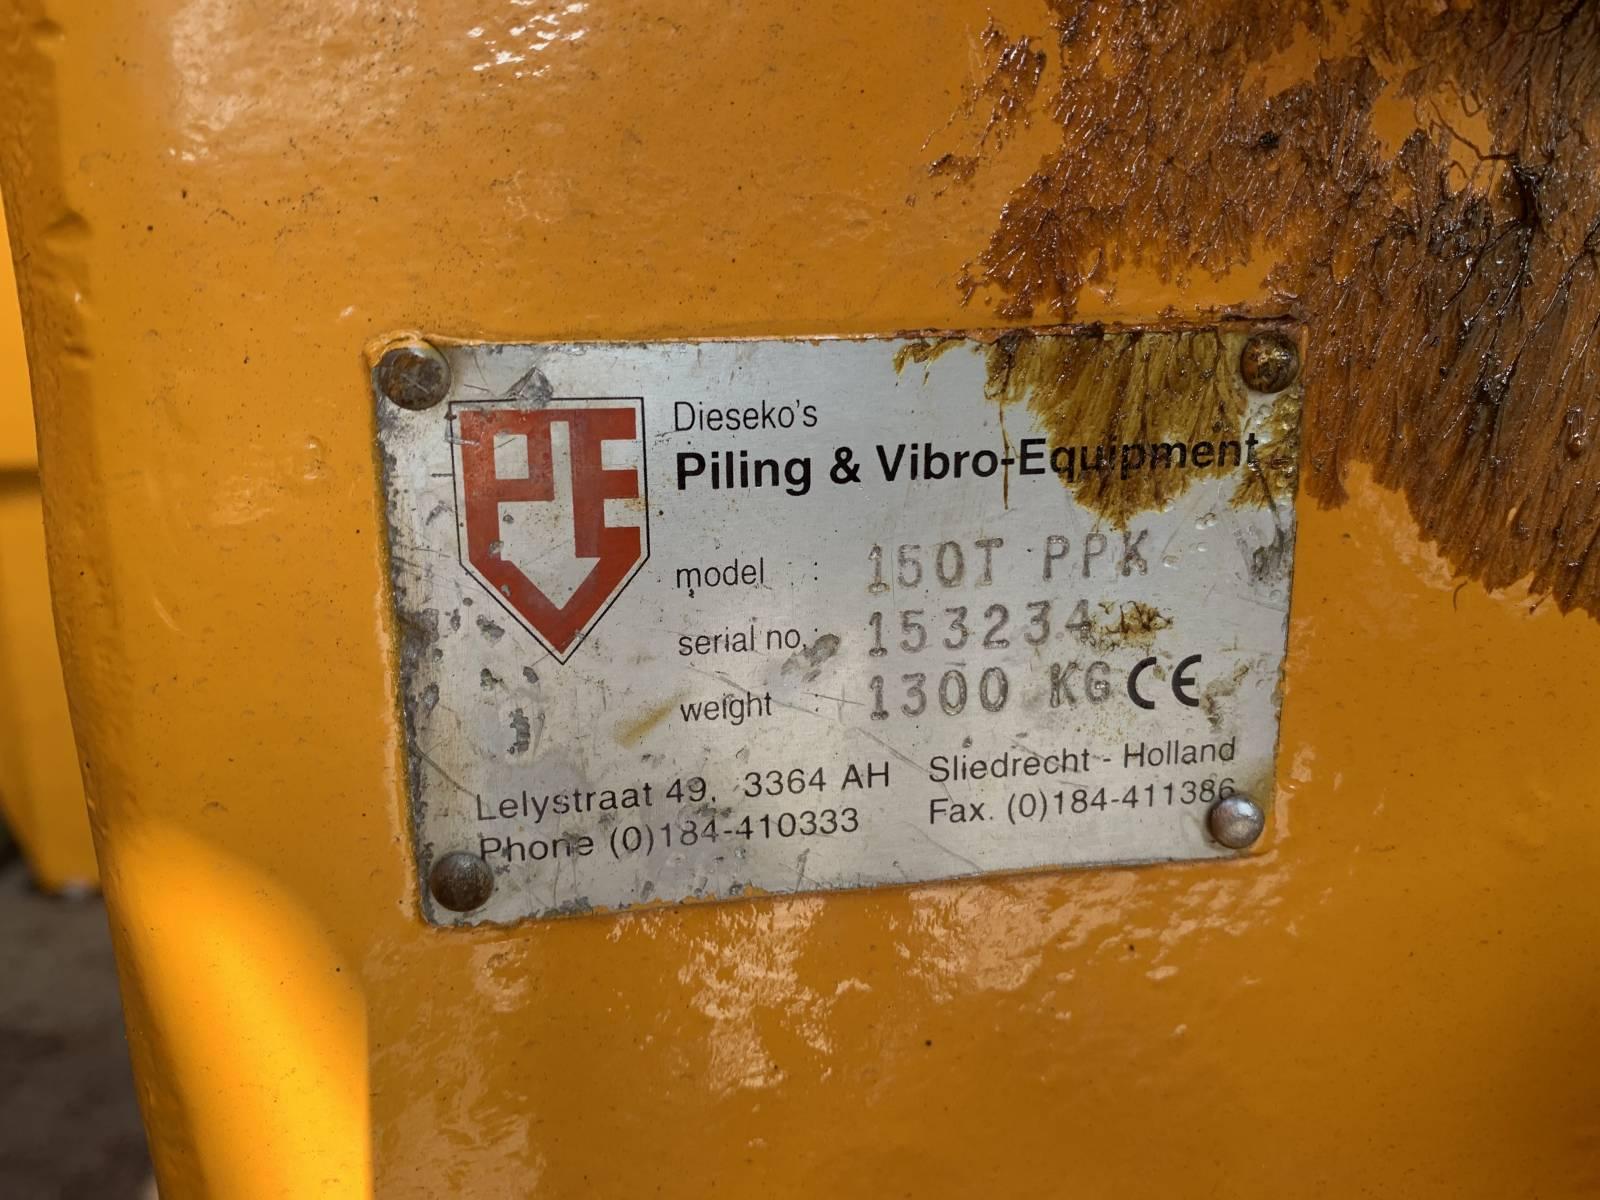 PVE 200M HYDRAULIC VIBRATORY HAMMER